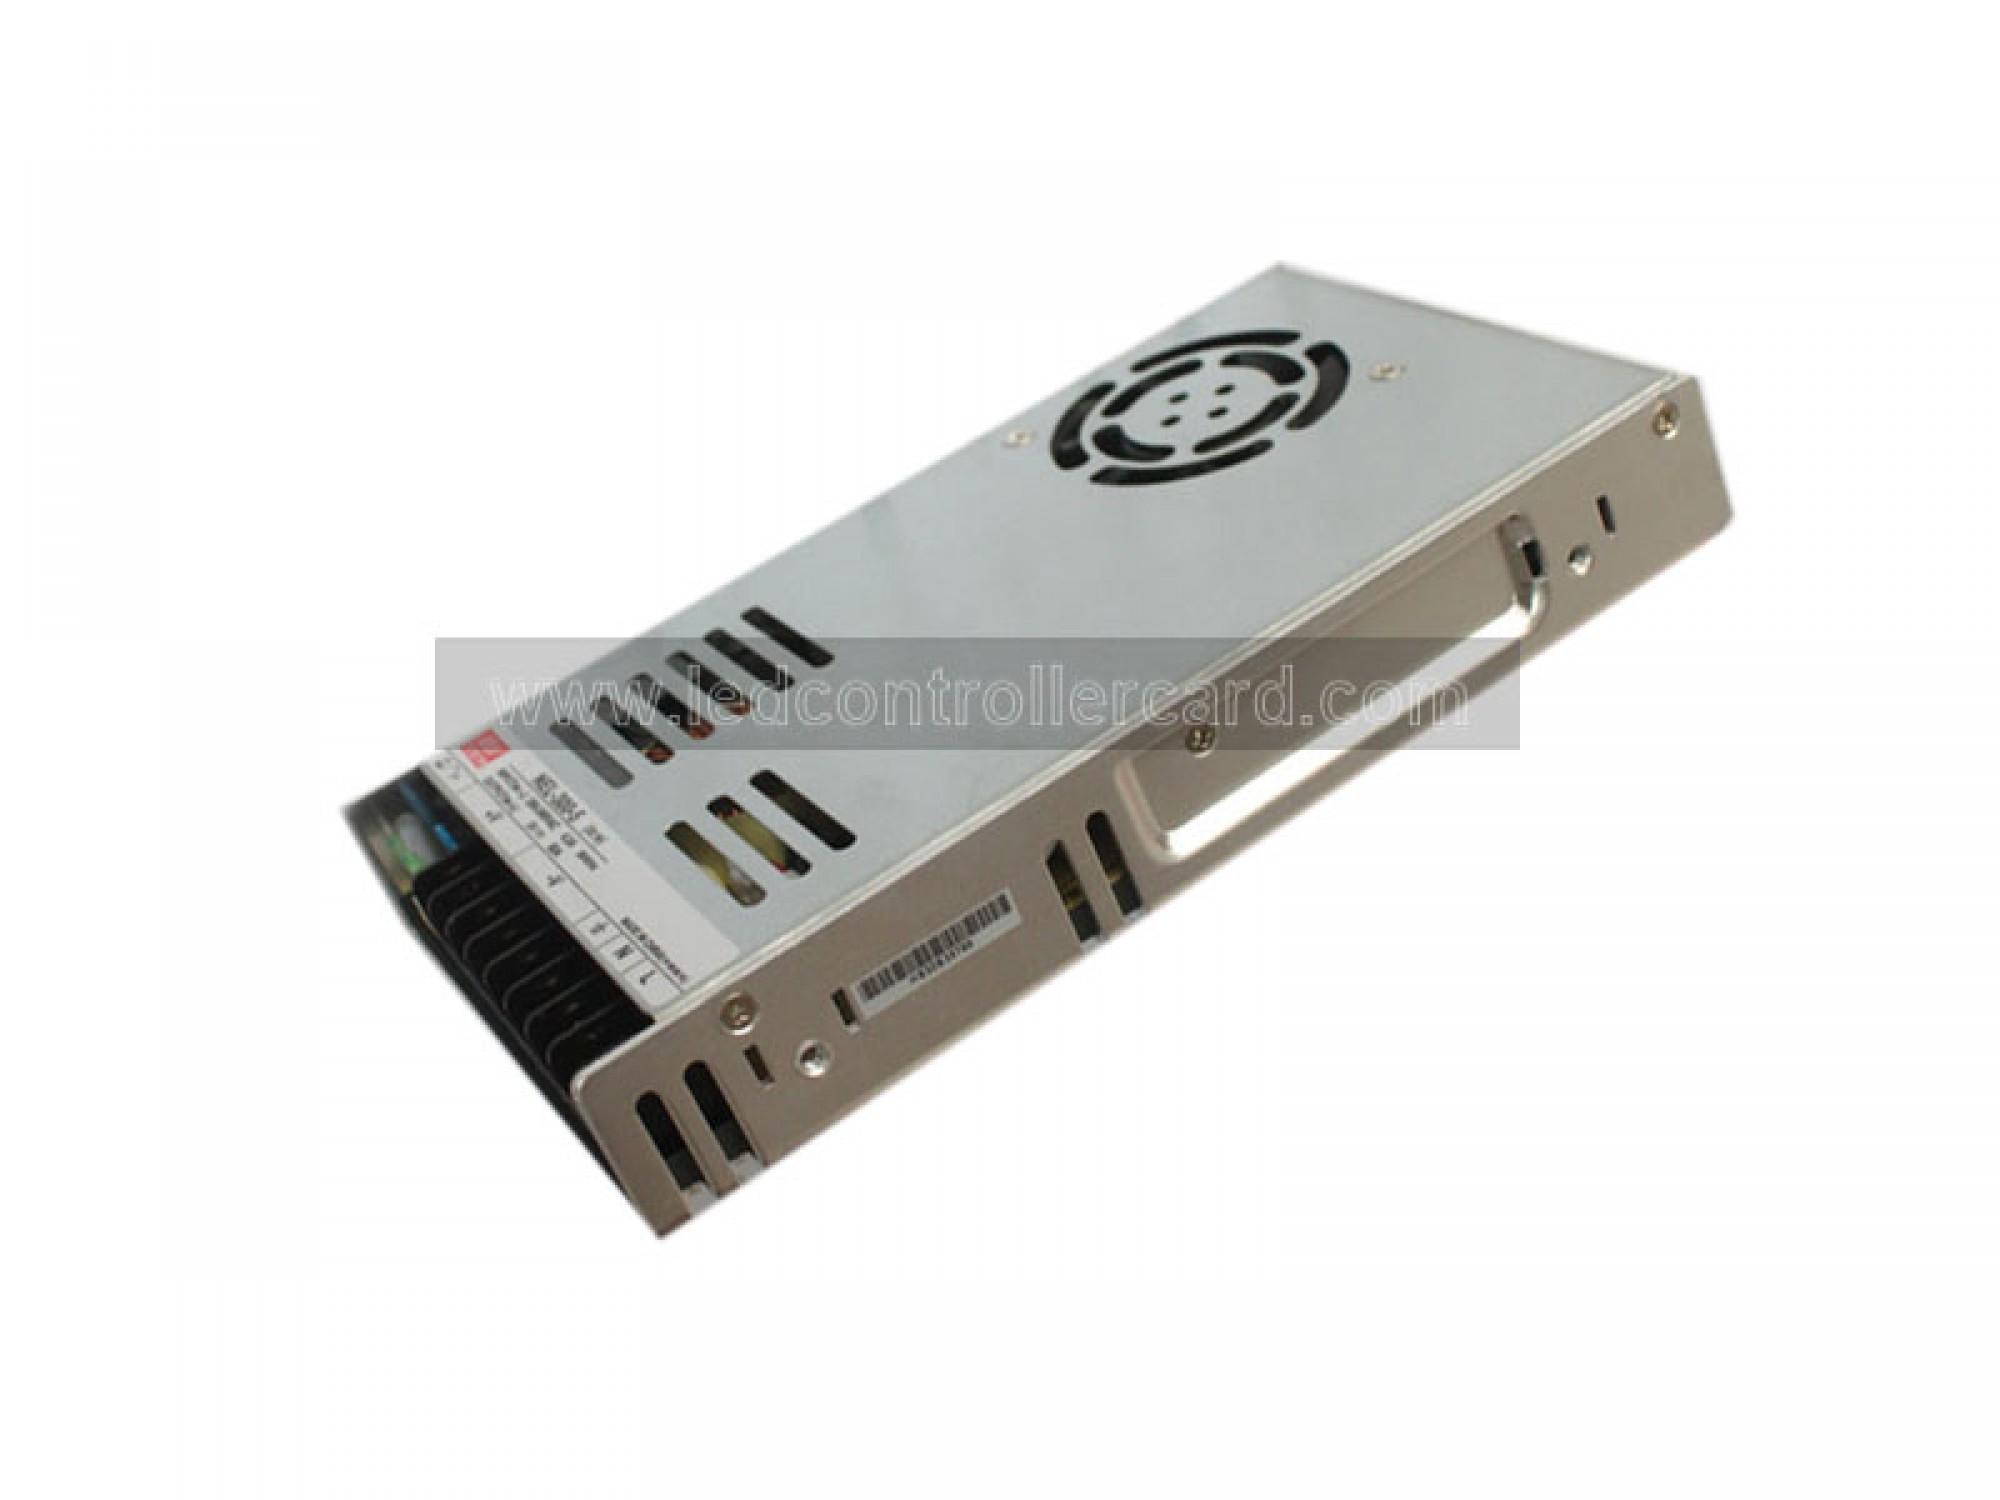 Meanwell NEL-300-5 5V60A 300W Ultra-Slim LED Display Power Supply